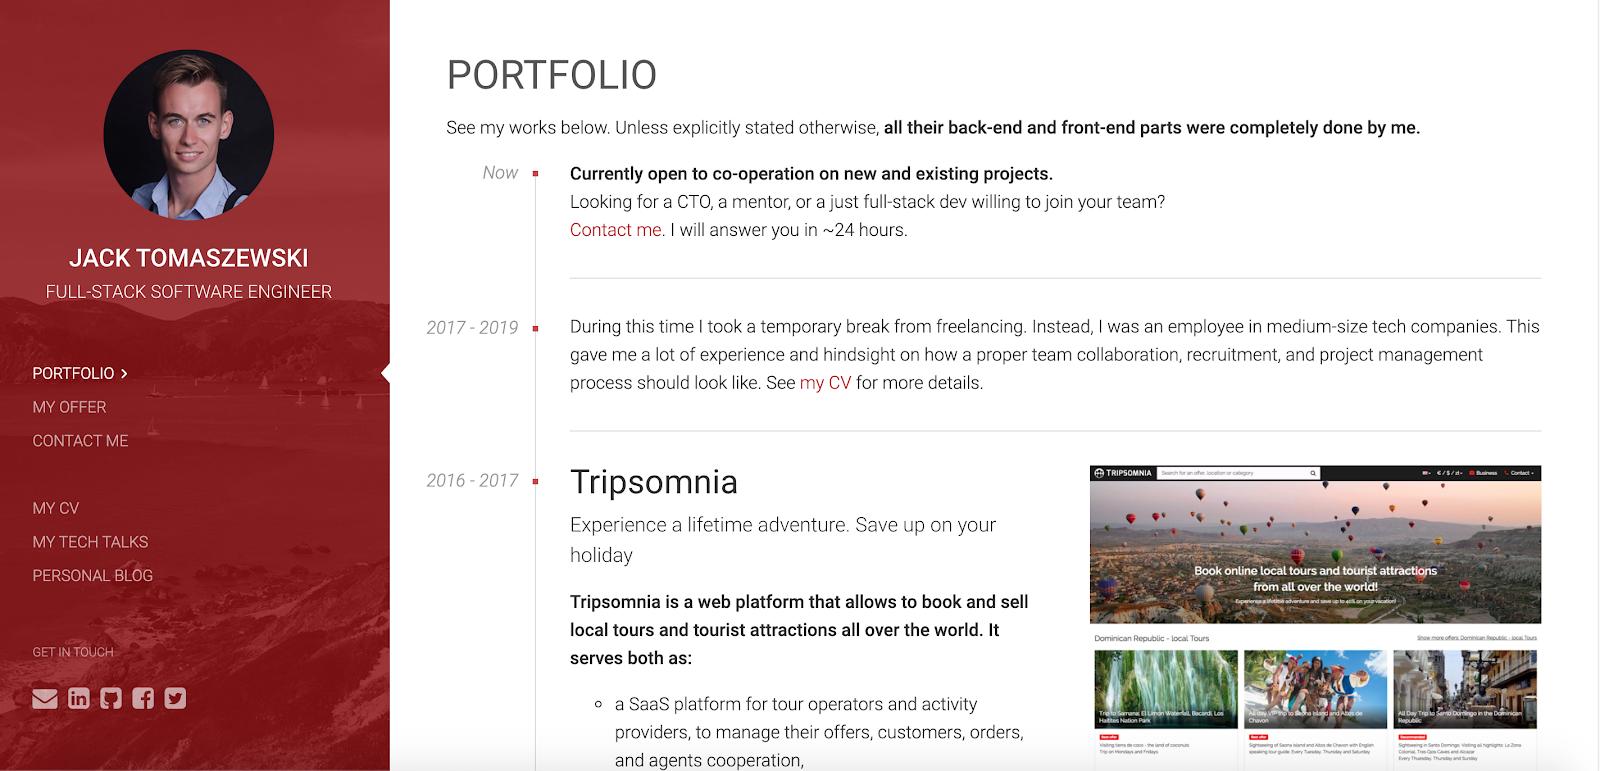 Web Developer Portfolio of Jack Tomaszewski